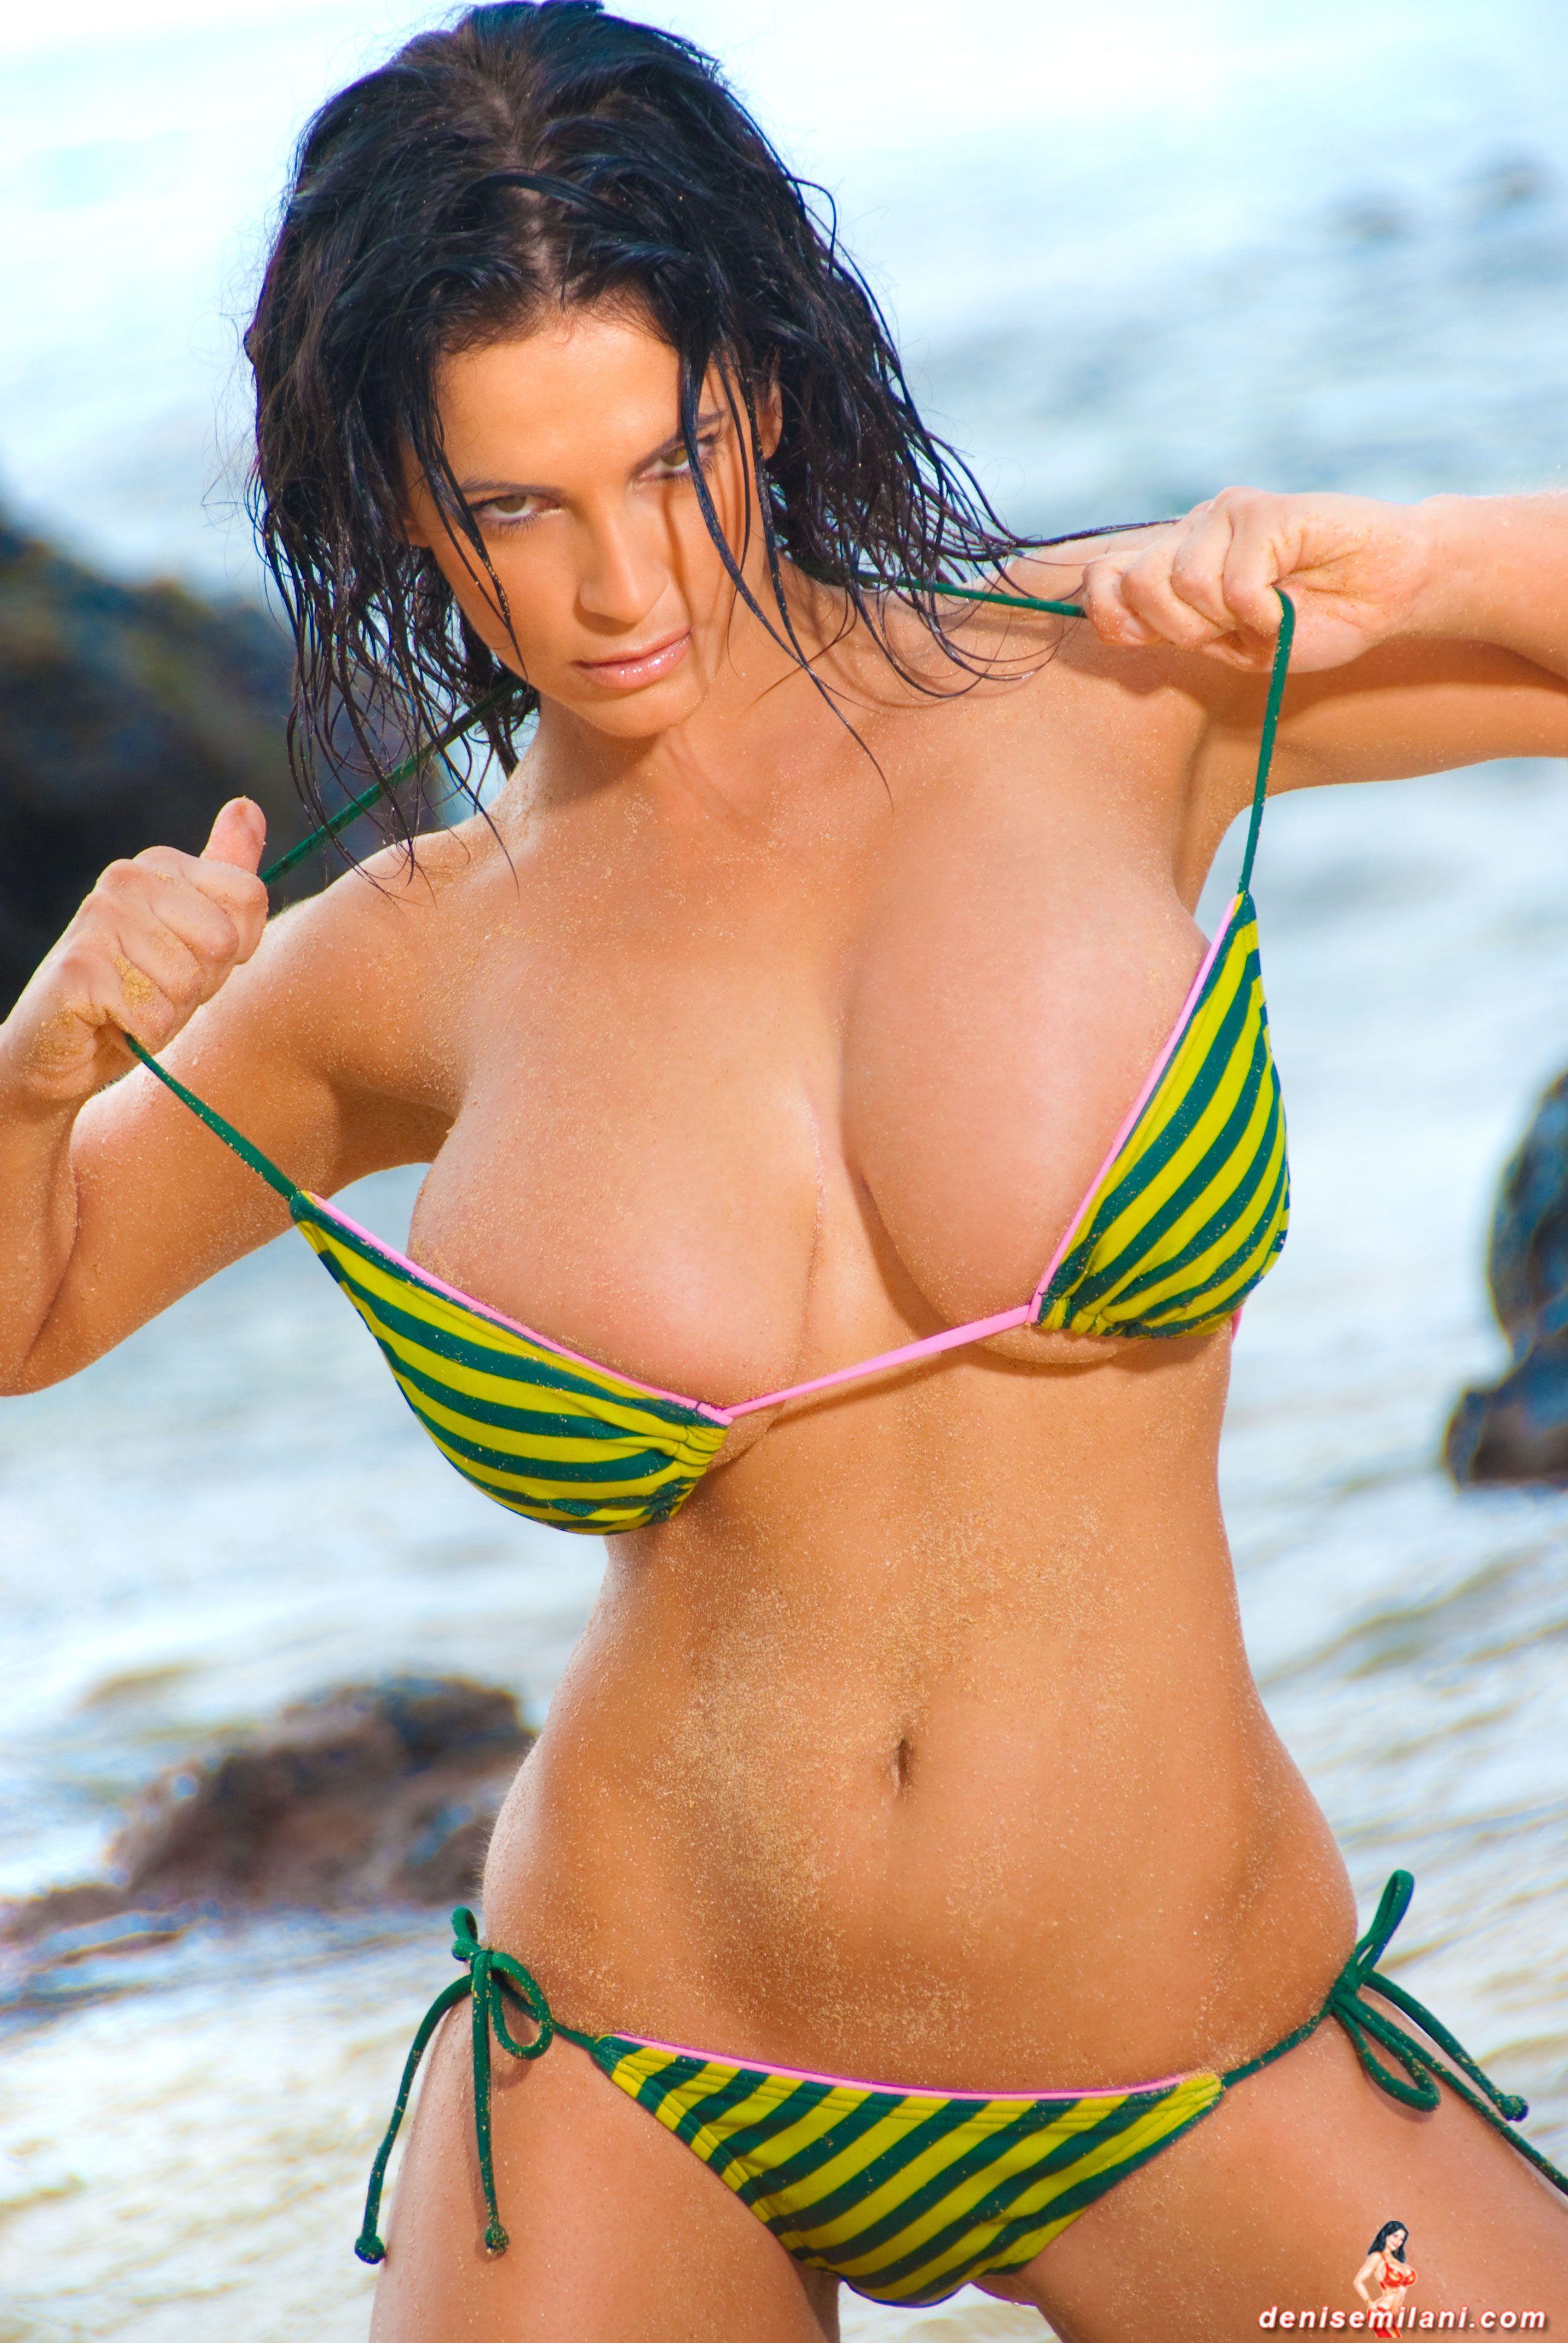 Denise milani green bikini pictures